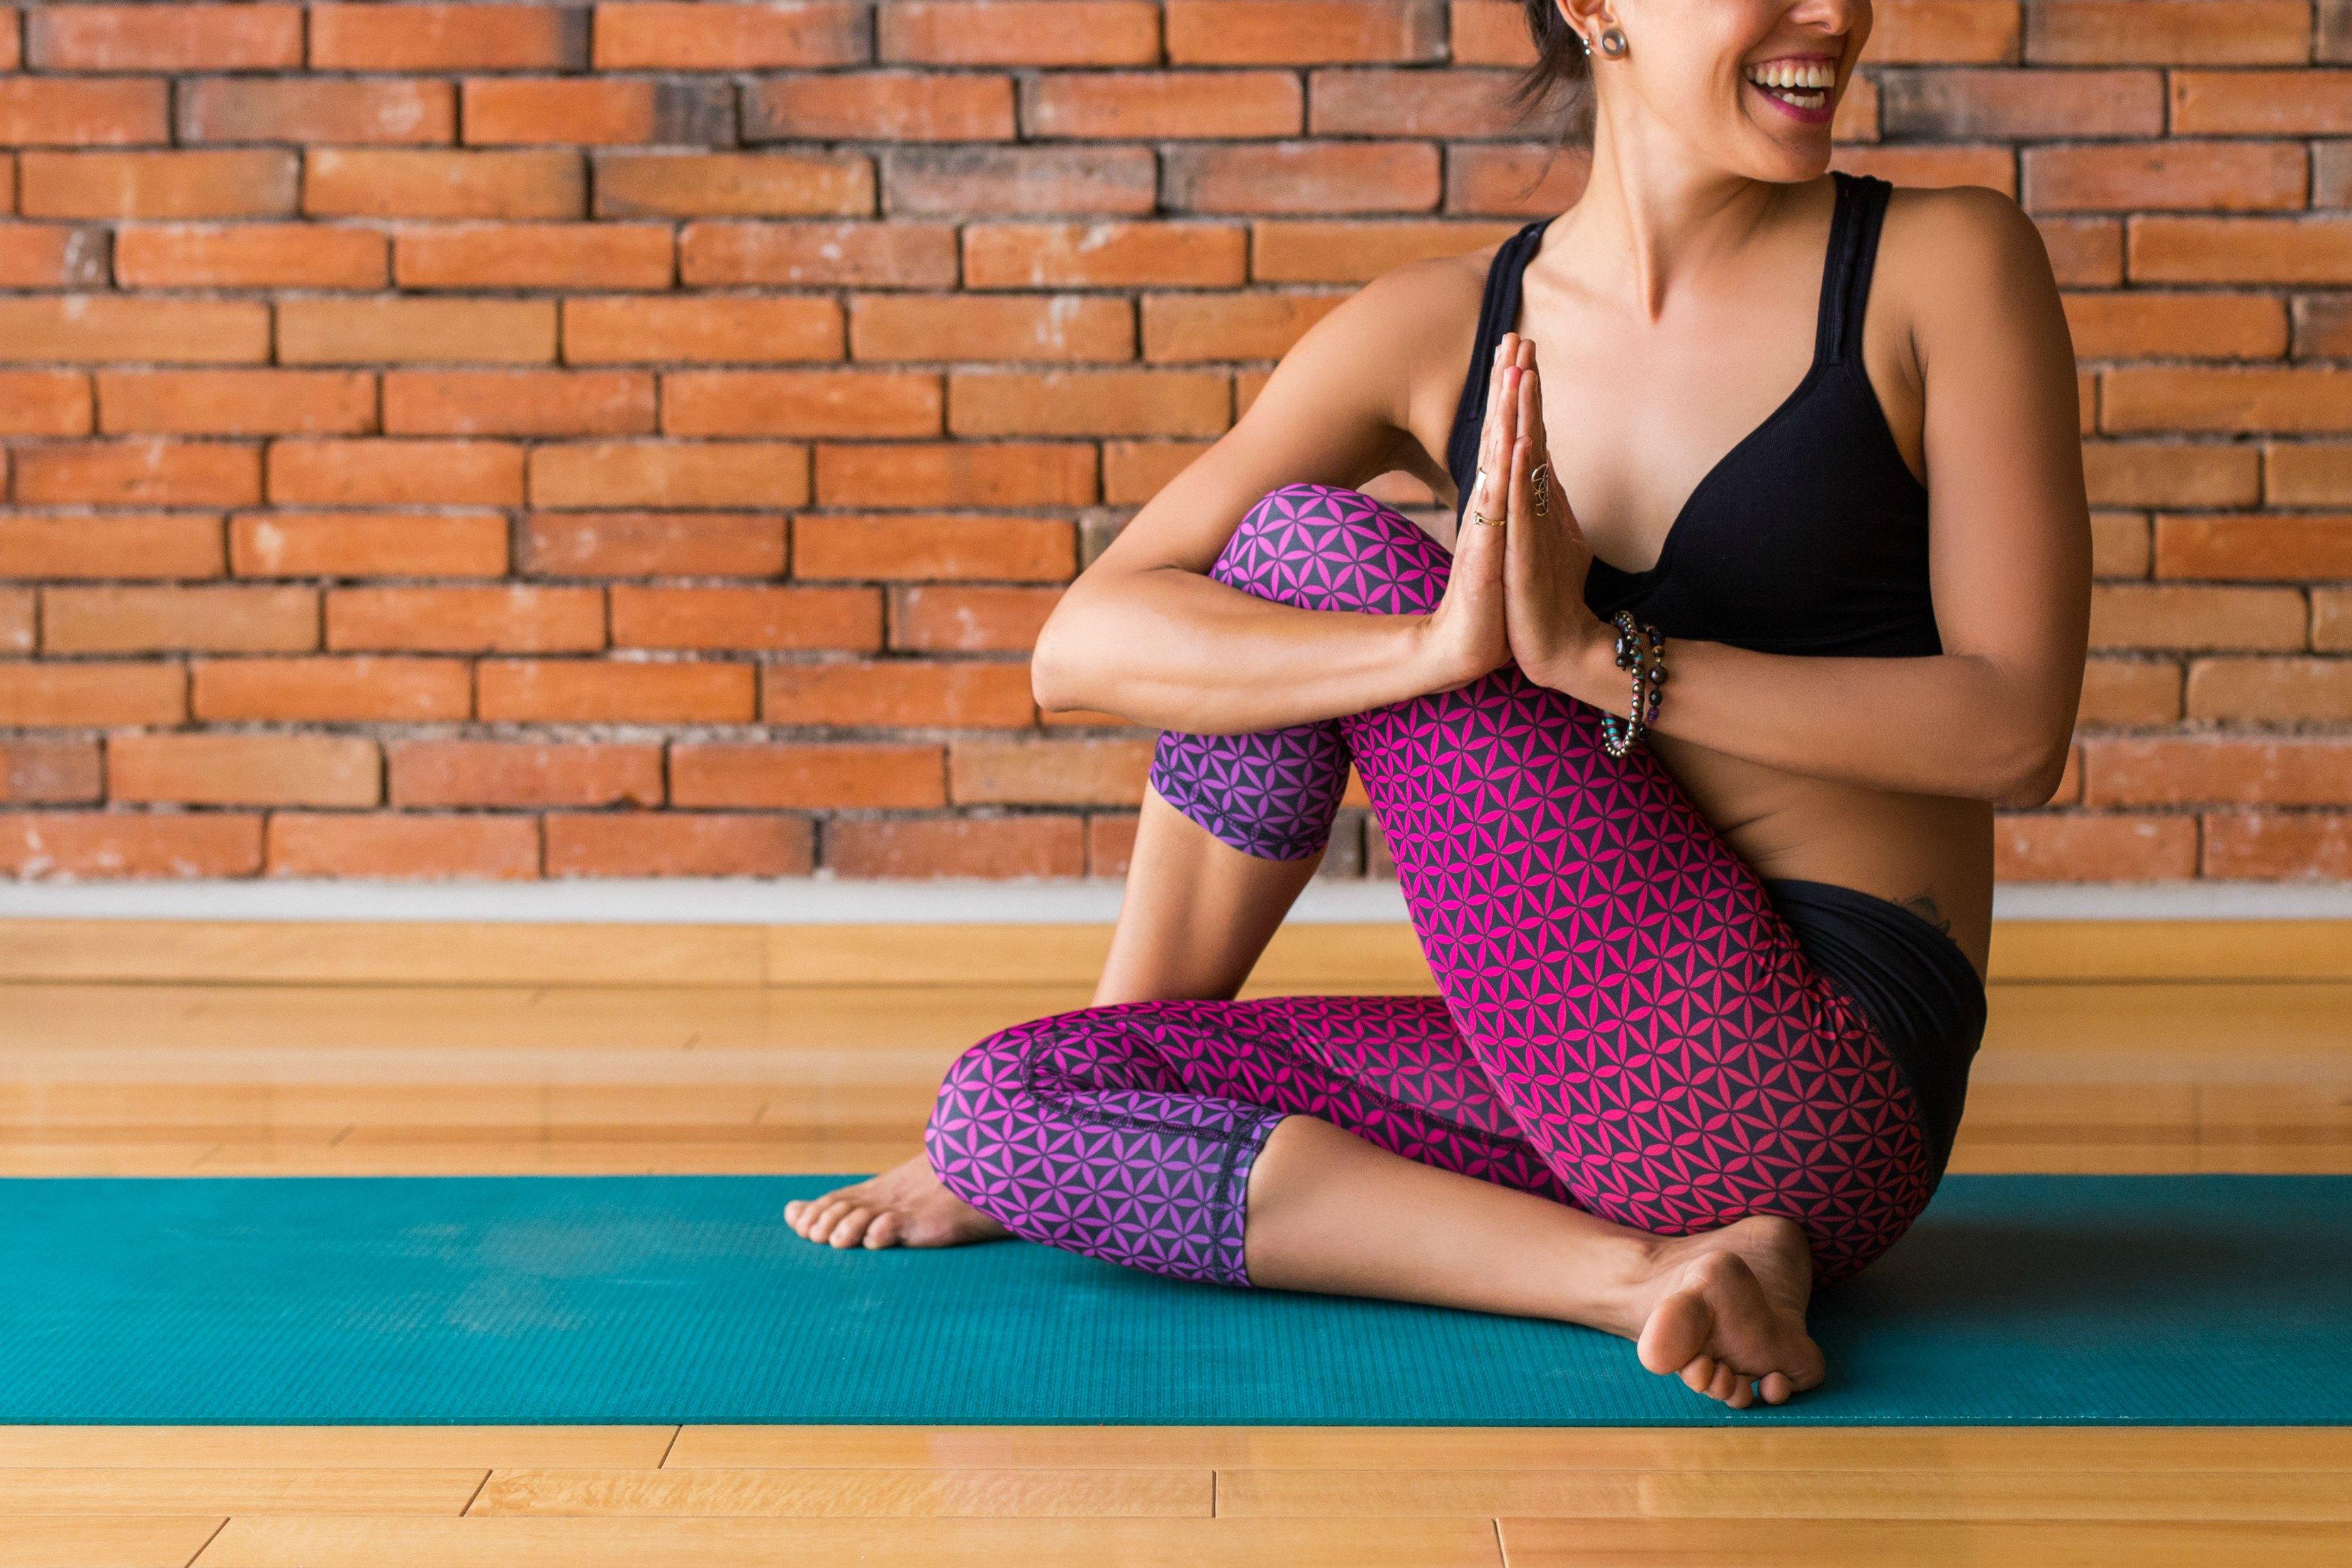 Change Your Life - Yoga is The Key